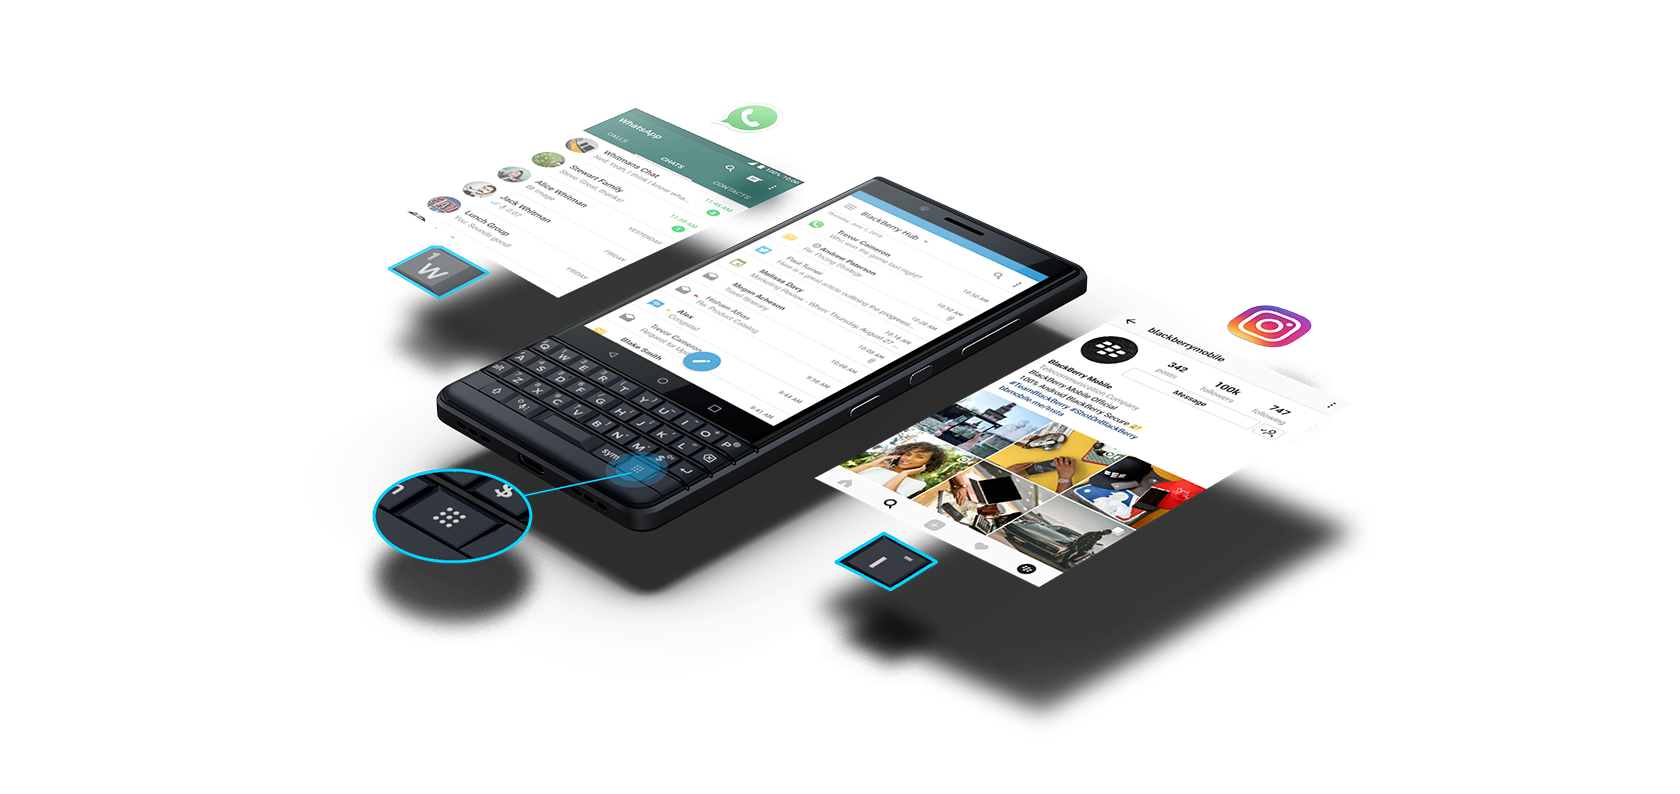 effortless efficiency transparent - BlackBerry KEY2 LE